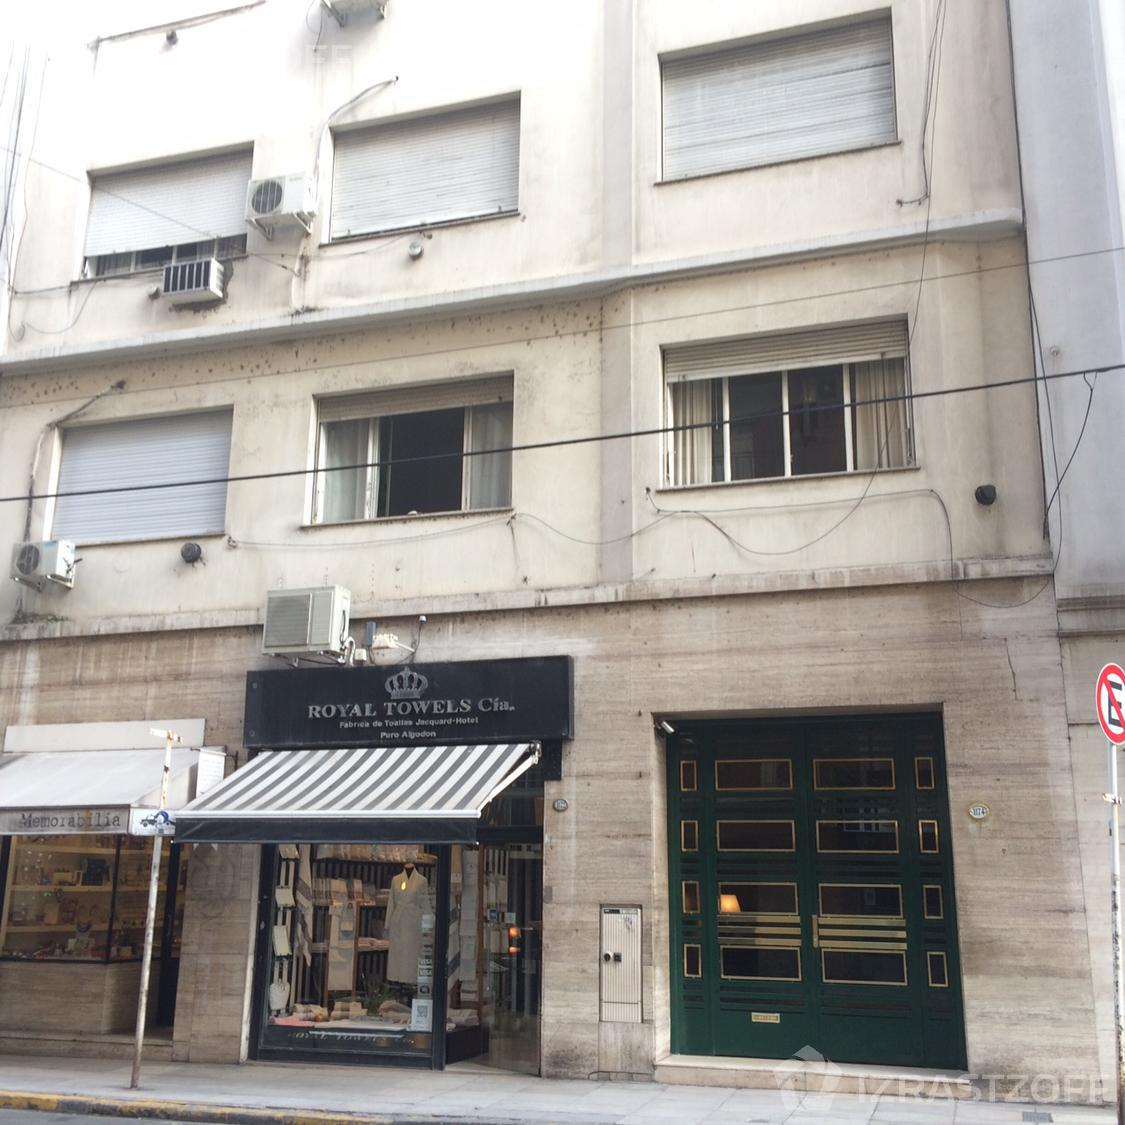 Departamento-Alquiler-Recoleta-Arenales e/Libertad y Cerrito